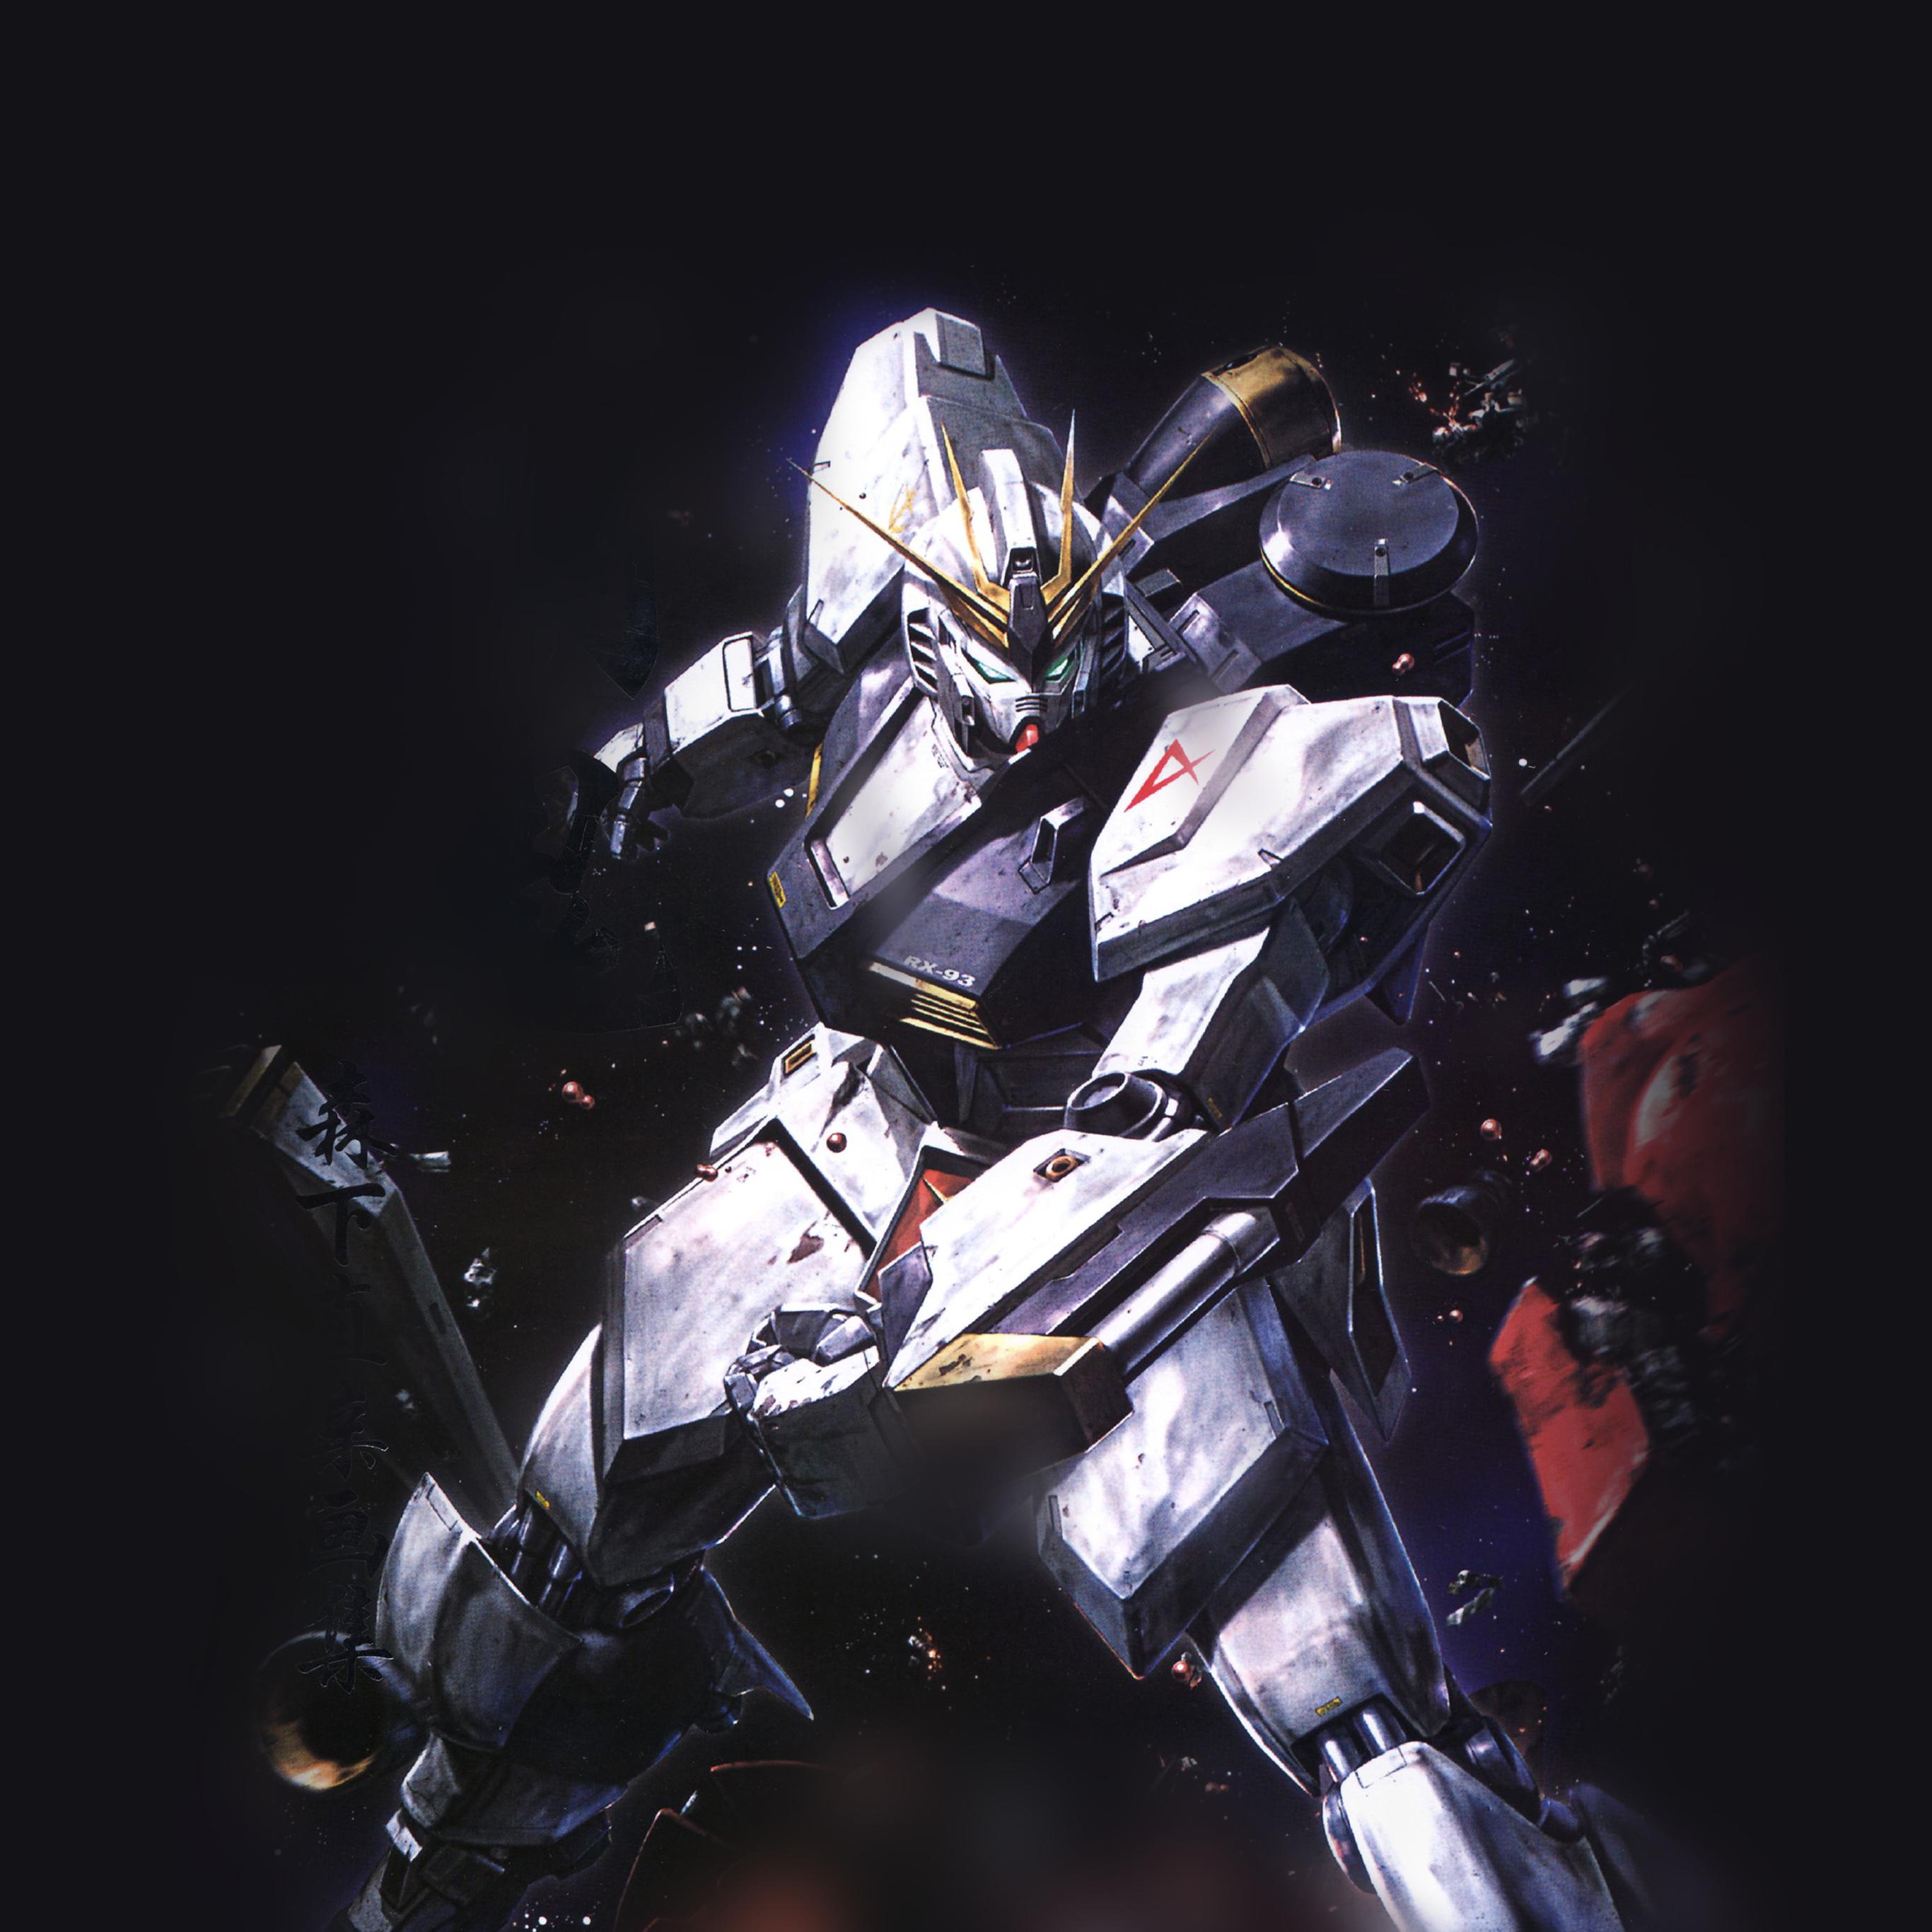 Gundam Iphone Wallpaper: IPad Retina